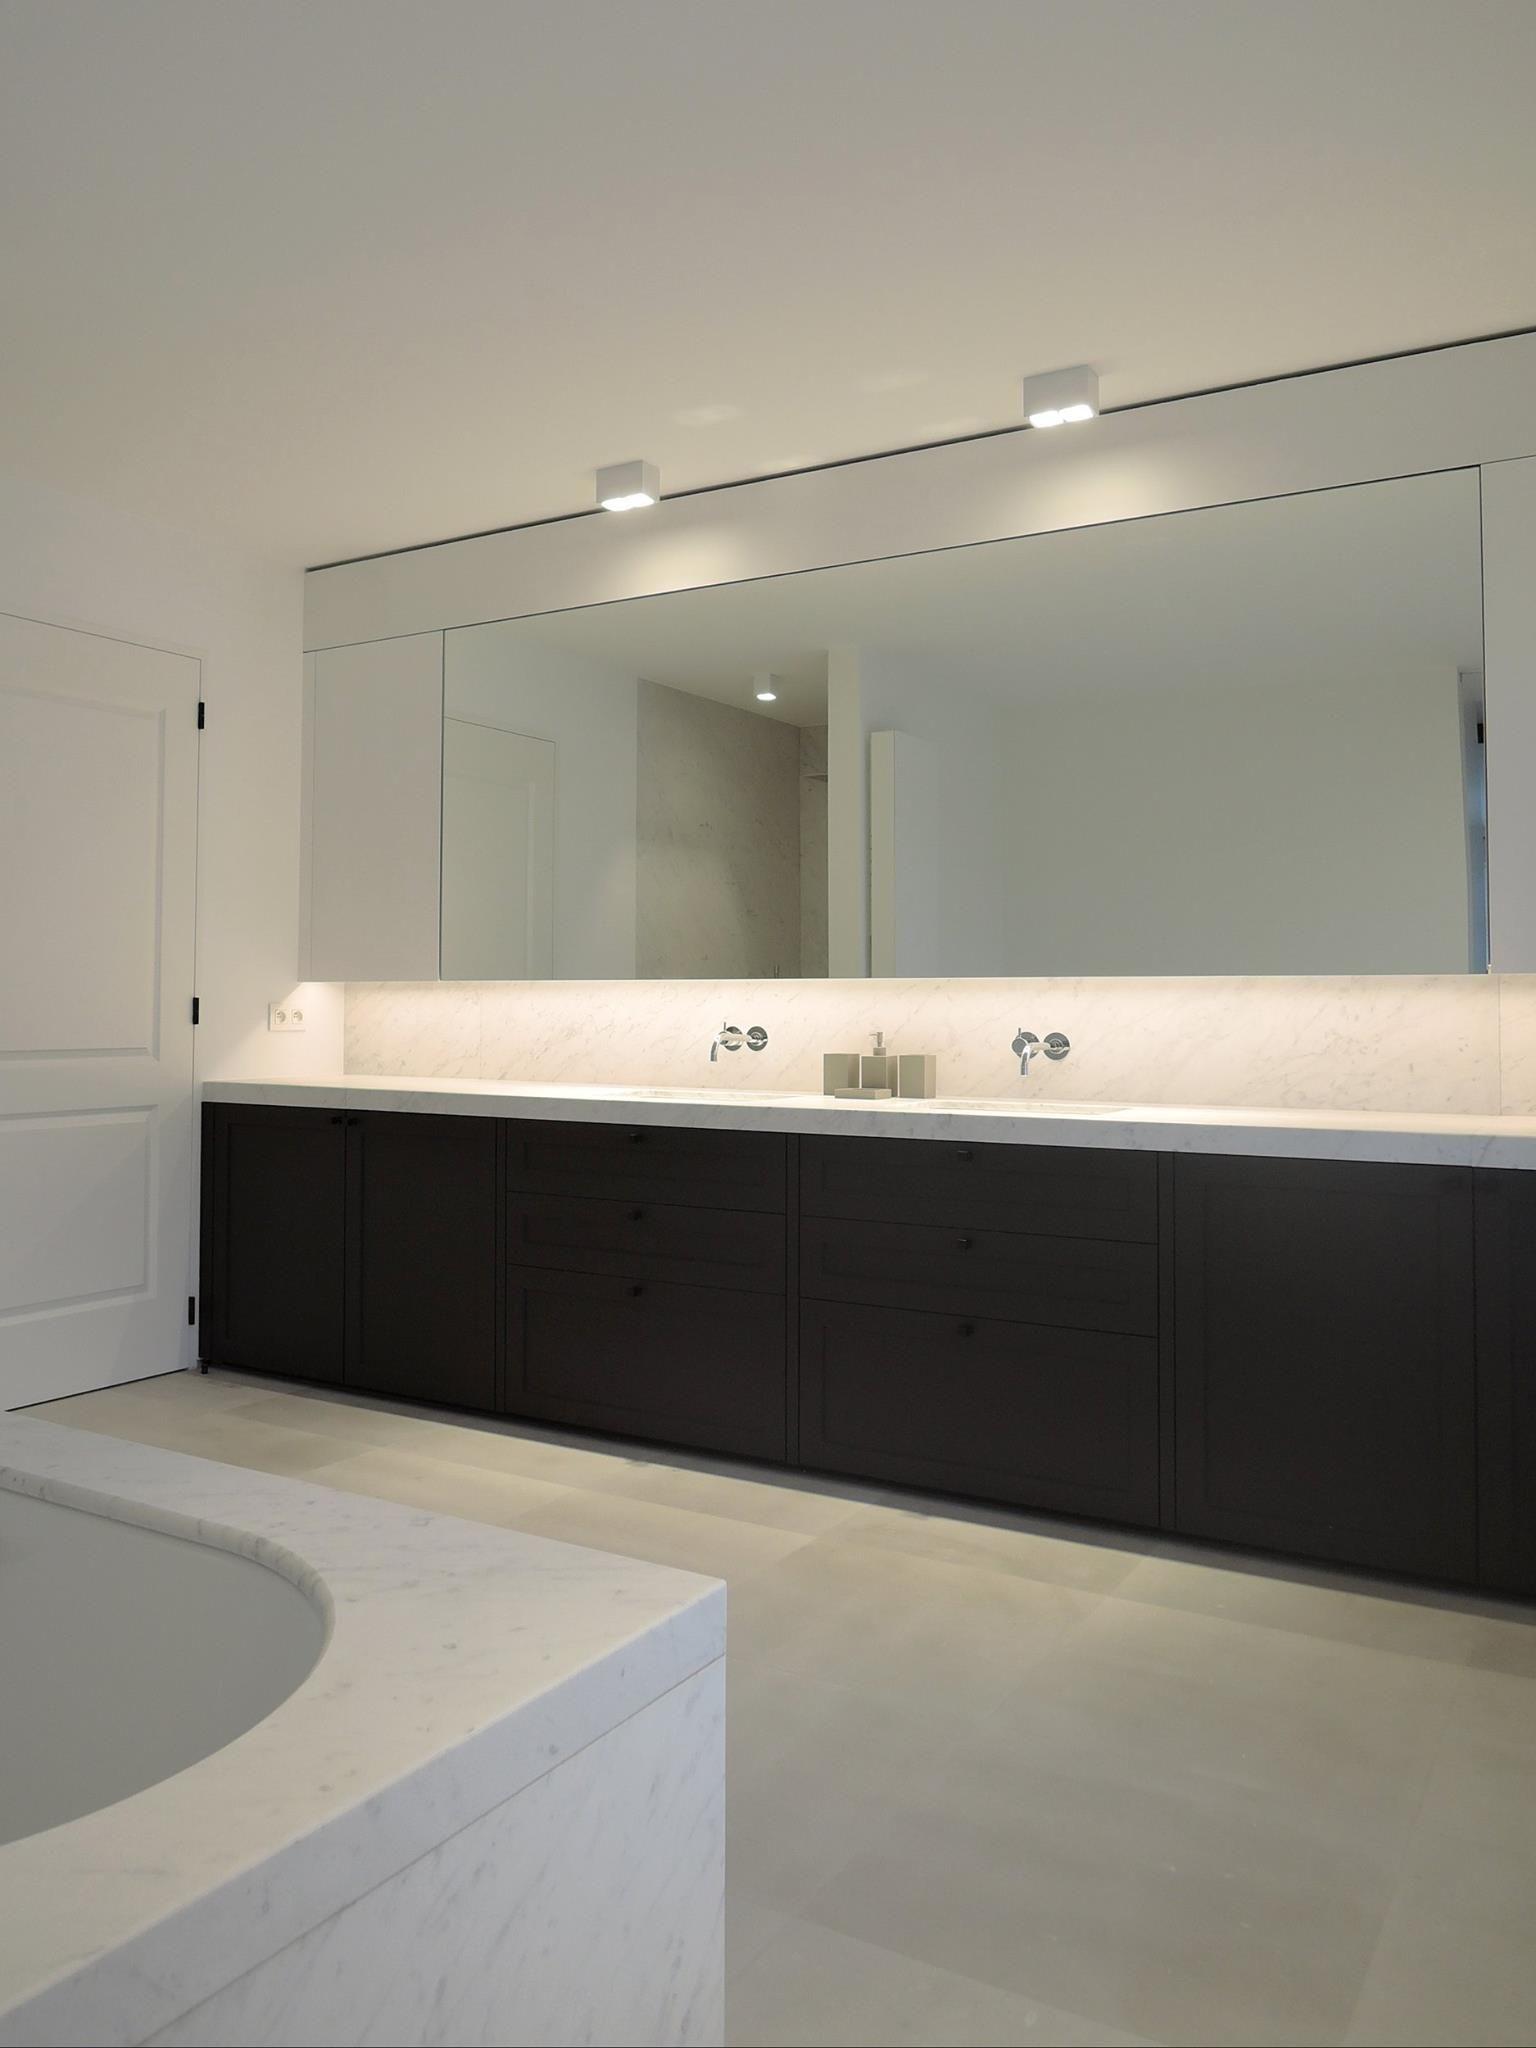 10+ Fabulous Rustic Counter Top Master Bath Ideas #countertop